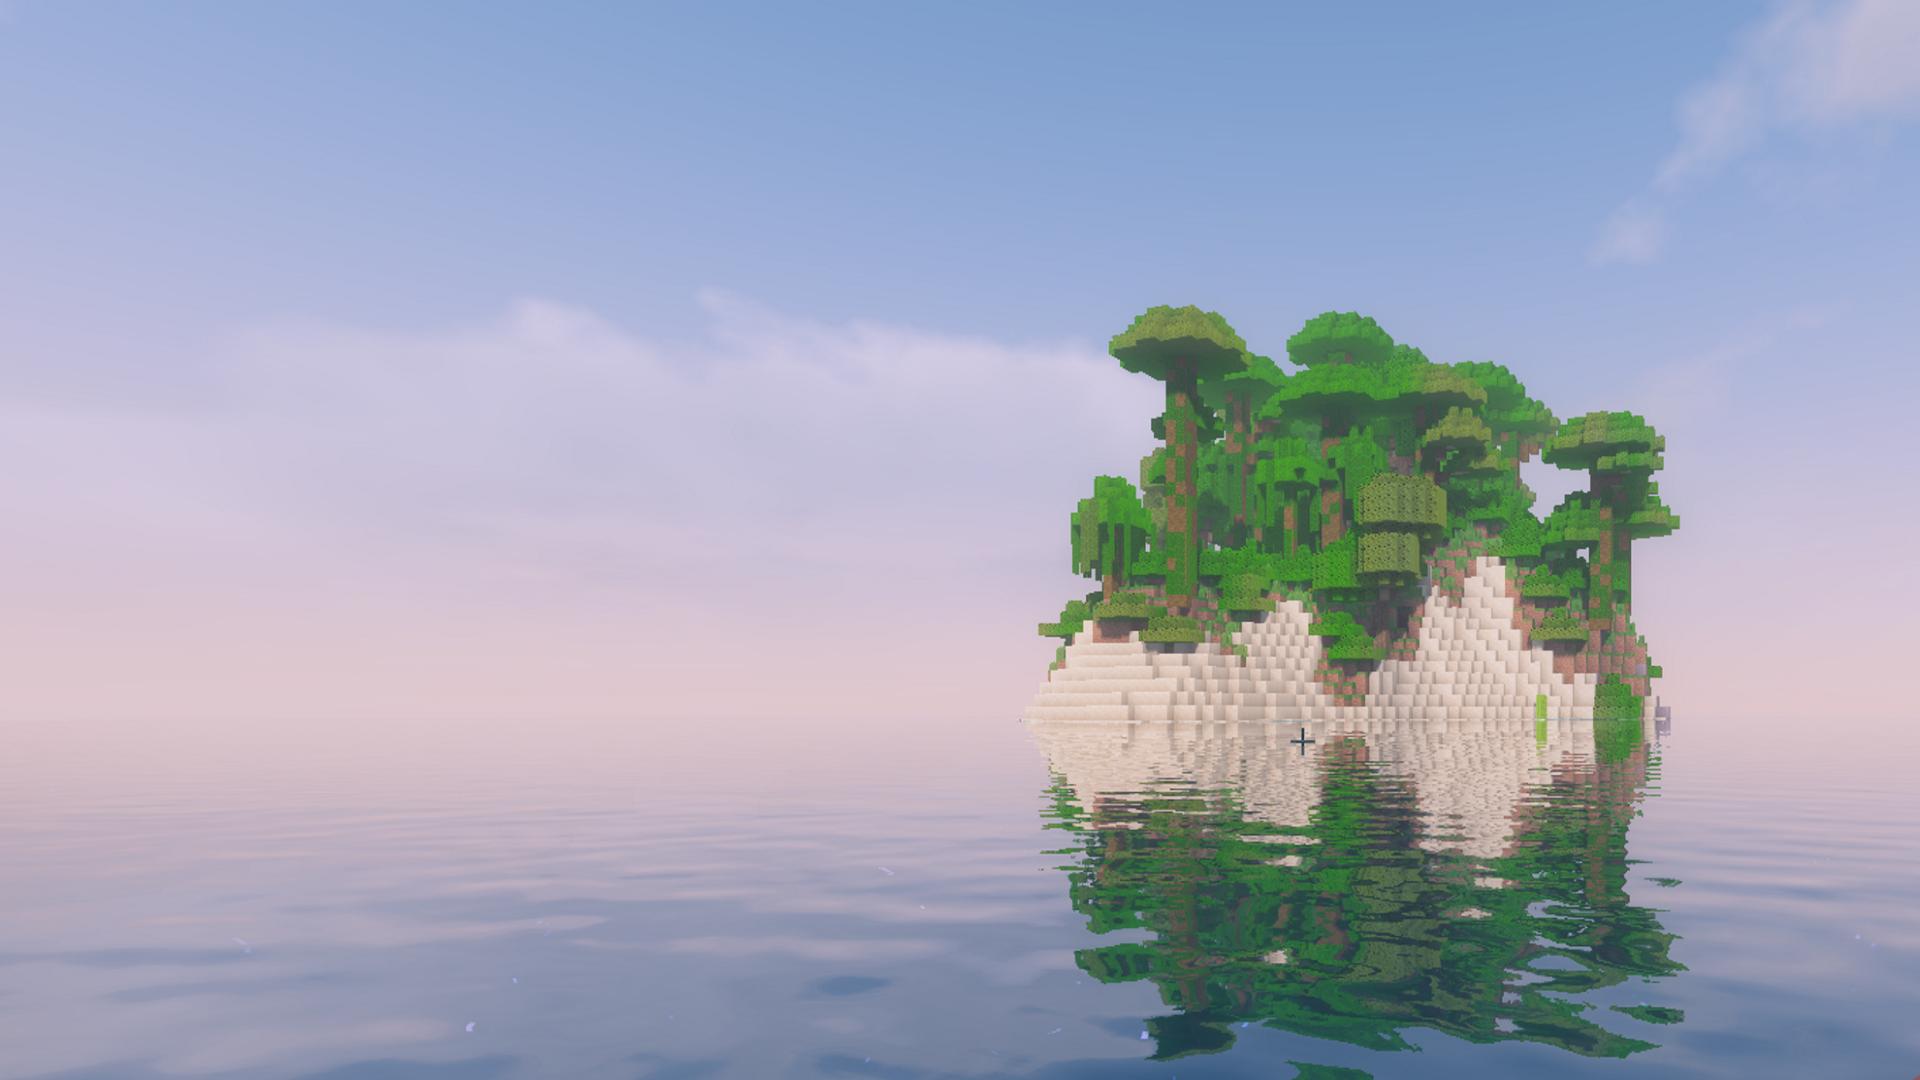 Minecraft Island [1920 x 1080]